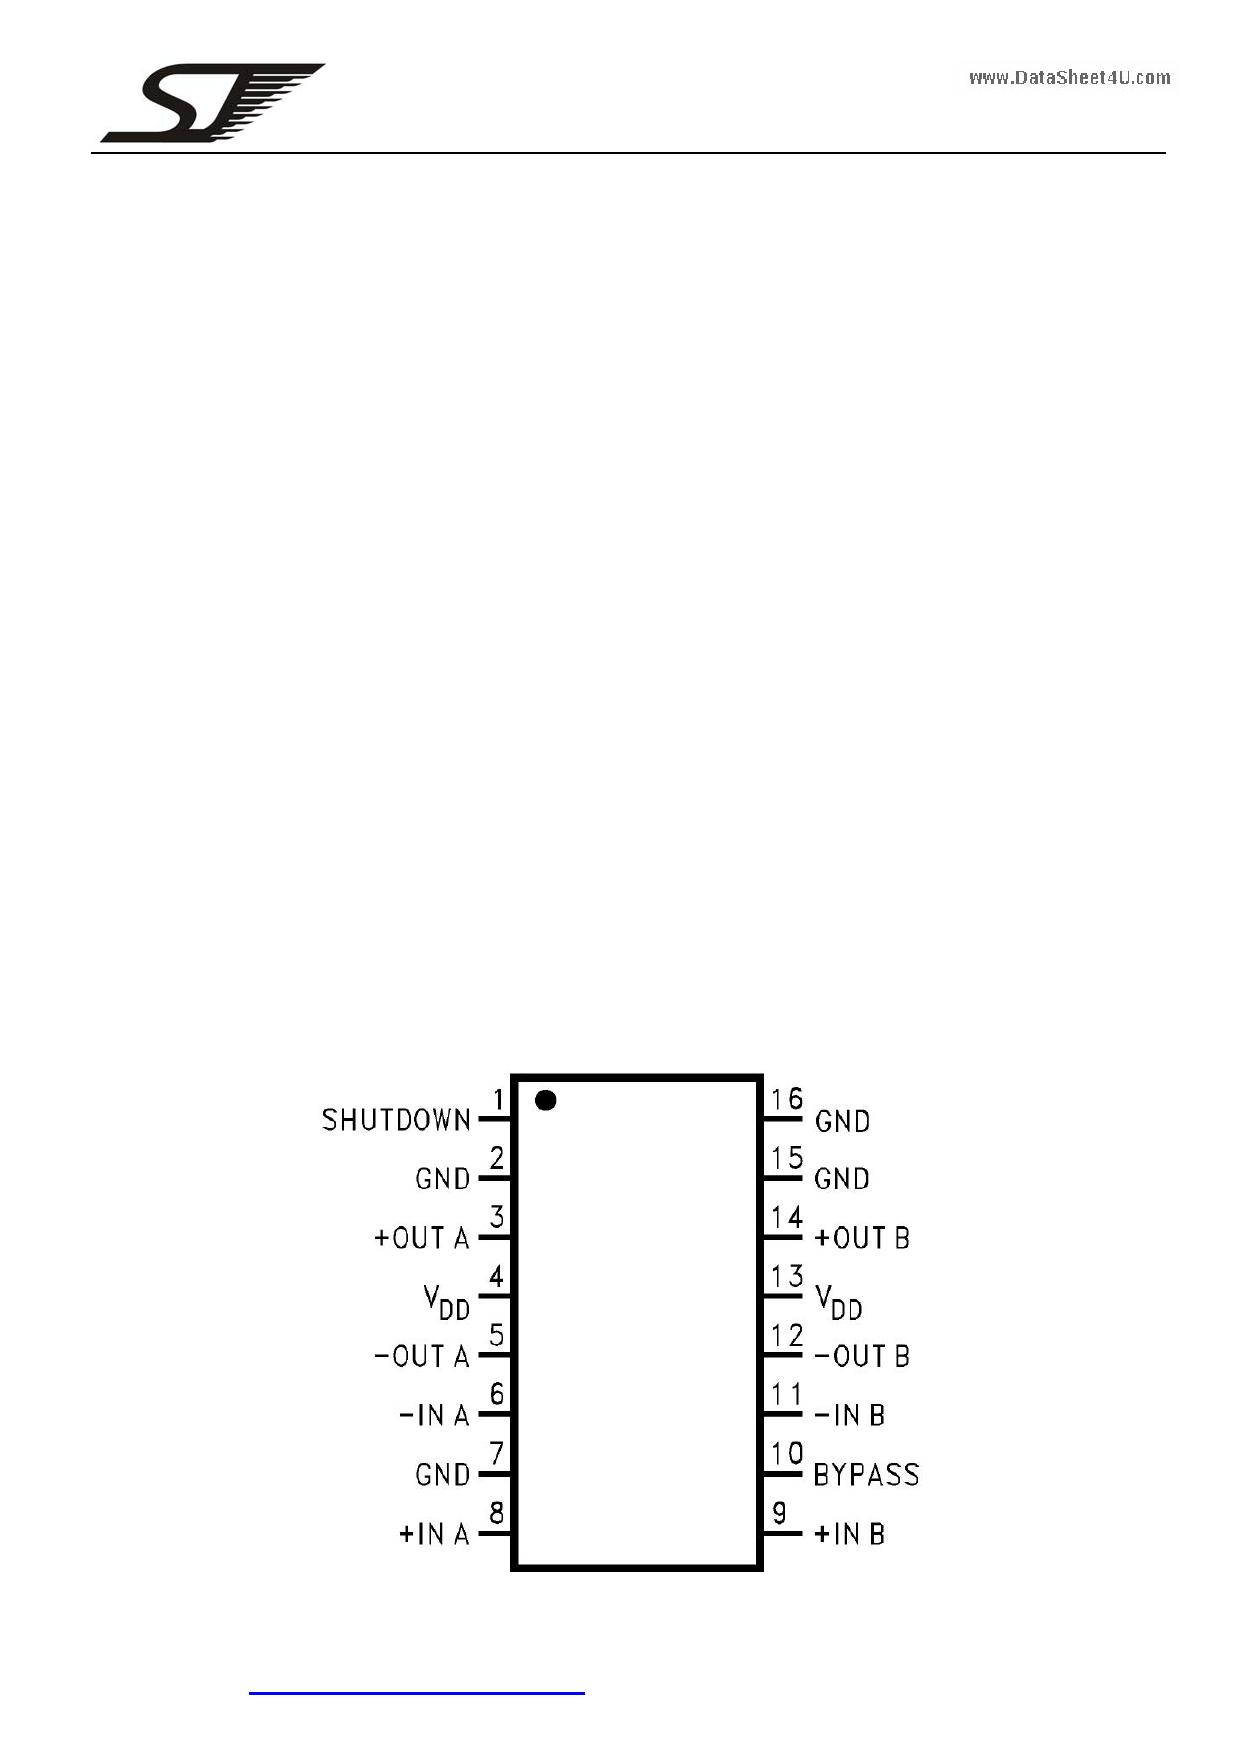 SJ2038 image